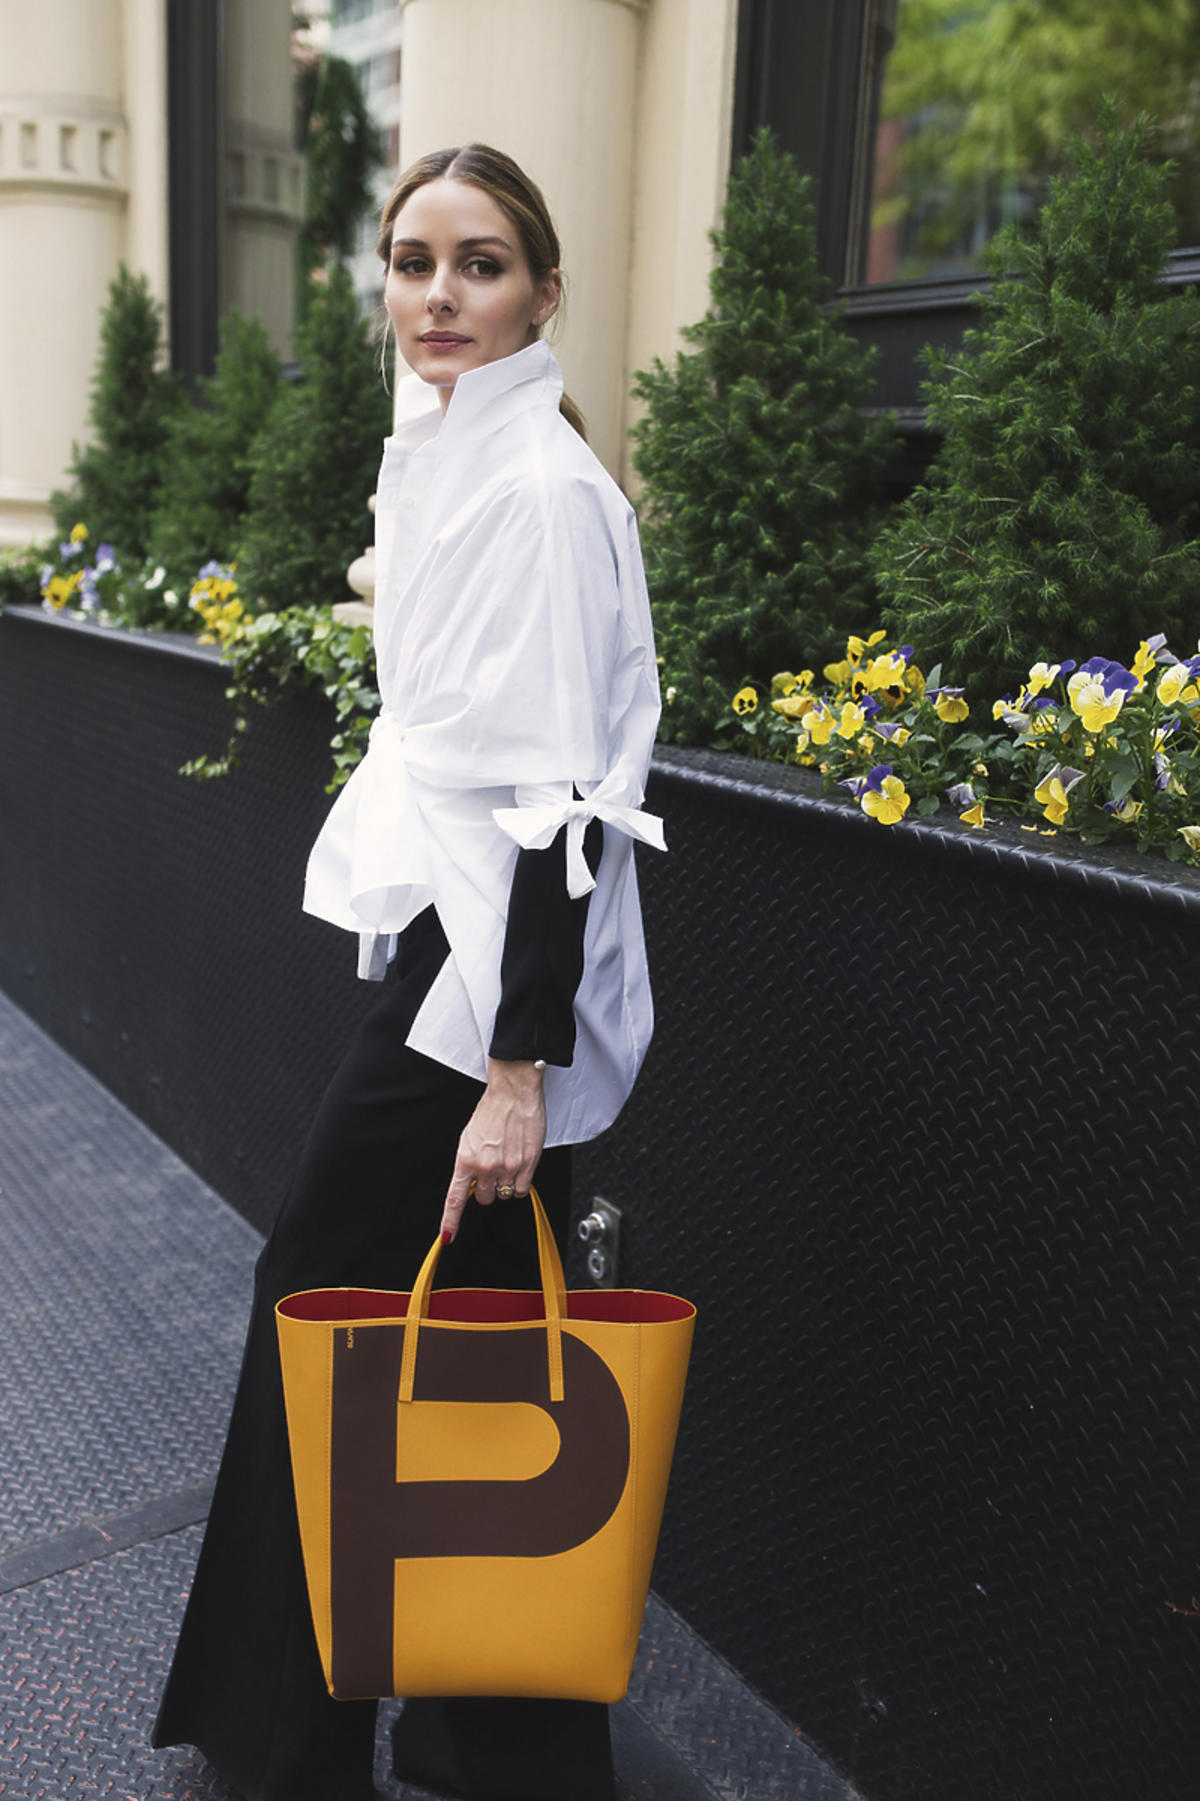 Olivia Palermo z żółtą torbą z literą P